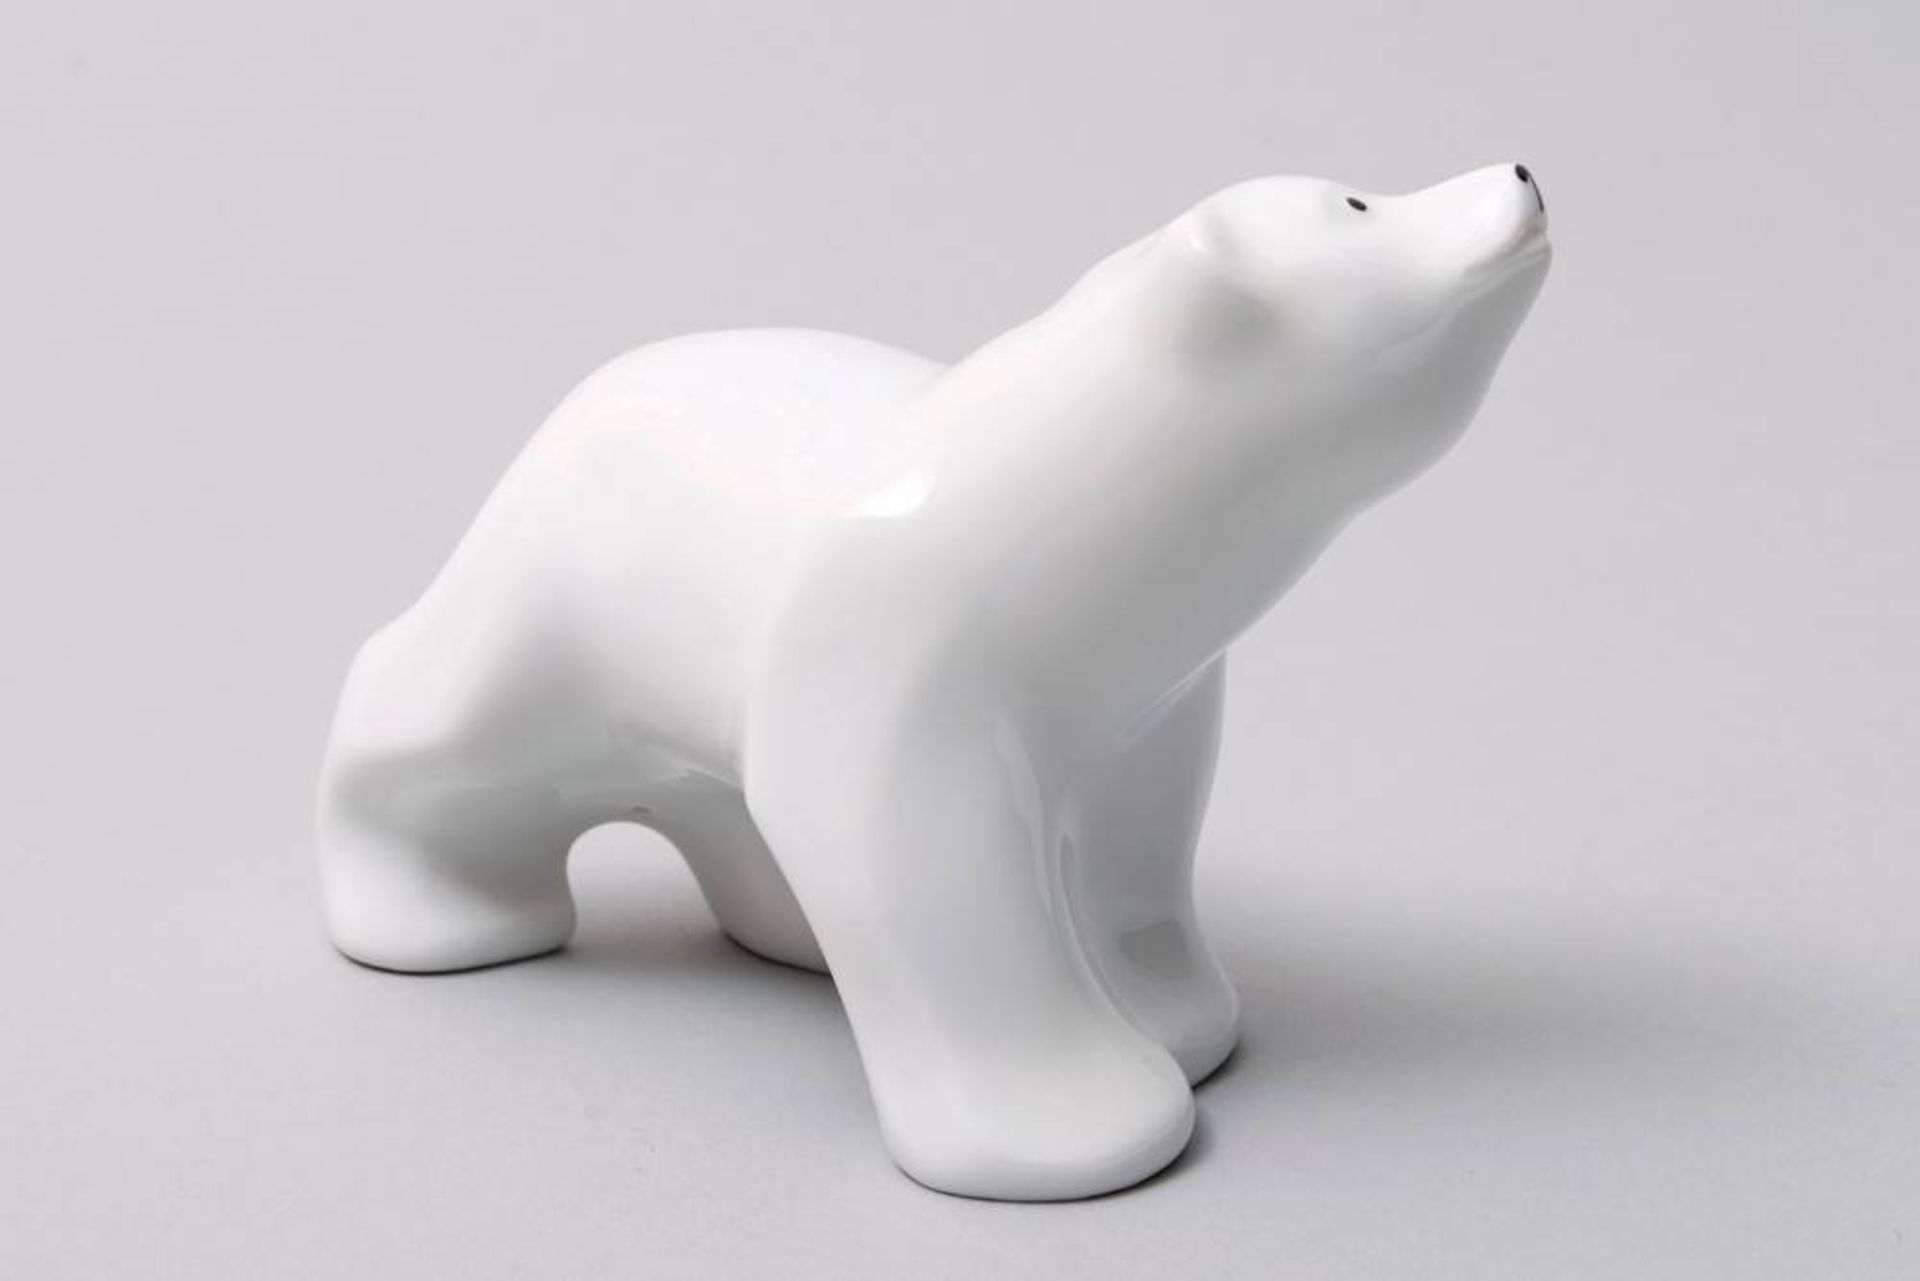 2 Bären, KPM-Berlin, 20. Jhdt. Weißporzellan, 1x sitzender Bär, die Pfoten hoch gestreckt, 1x - Bild 4 aus 5